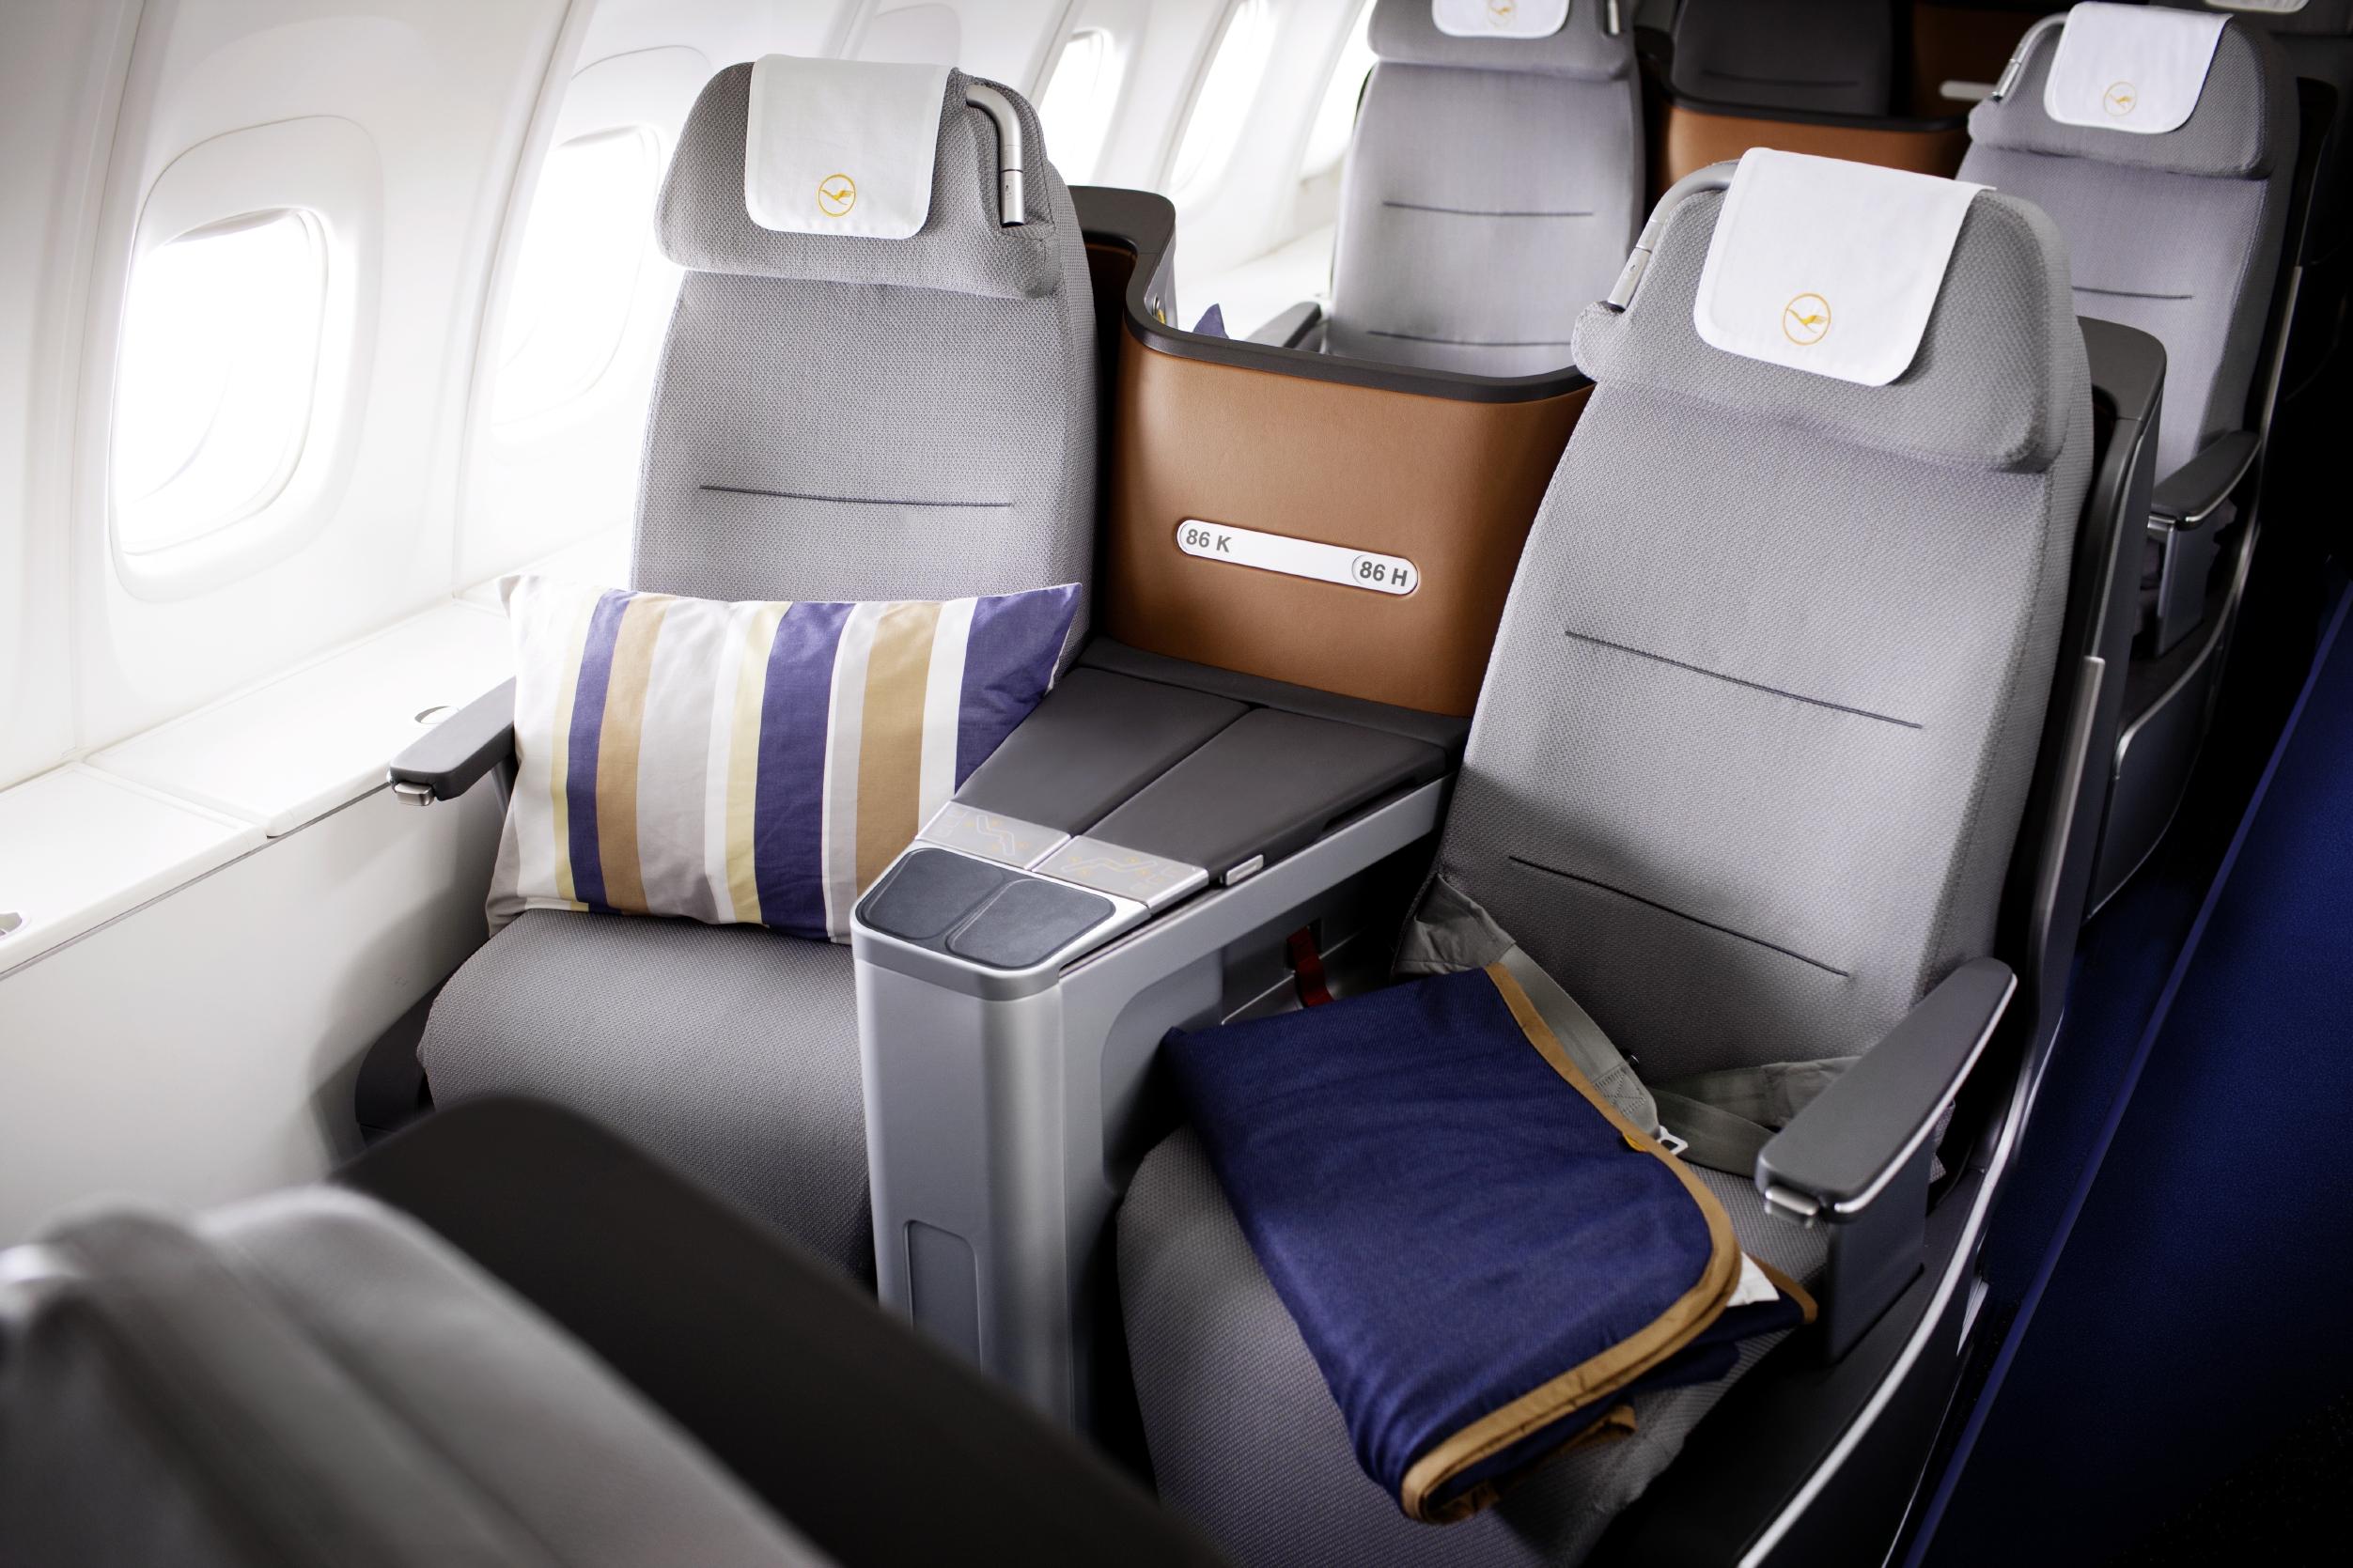 lufthansa upgrades frankfurt chennai flight to new business class bangalore aviation. Black Bedroom Furniture Sets. Home Design Ideas